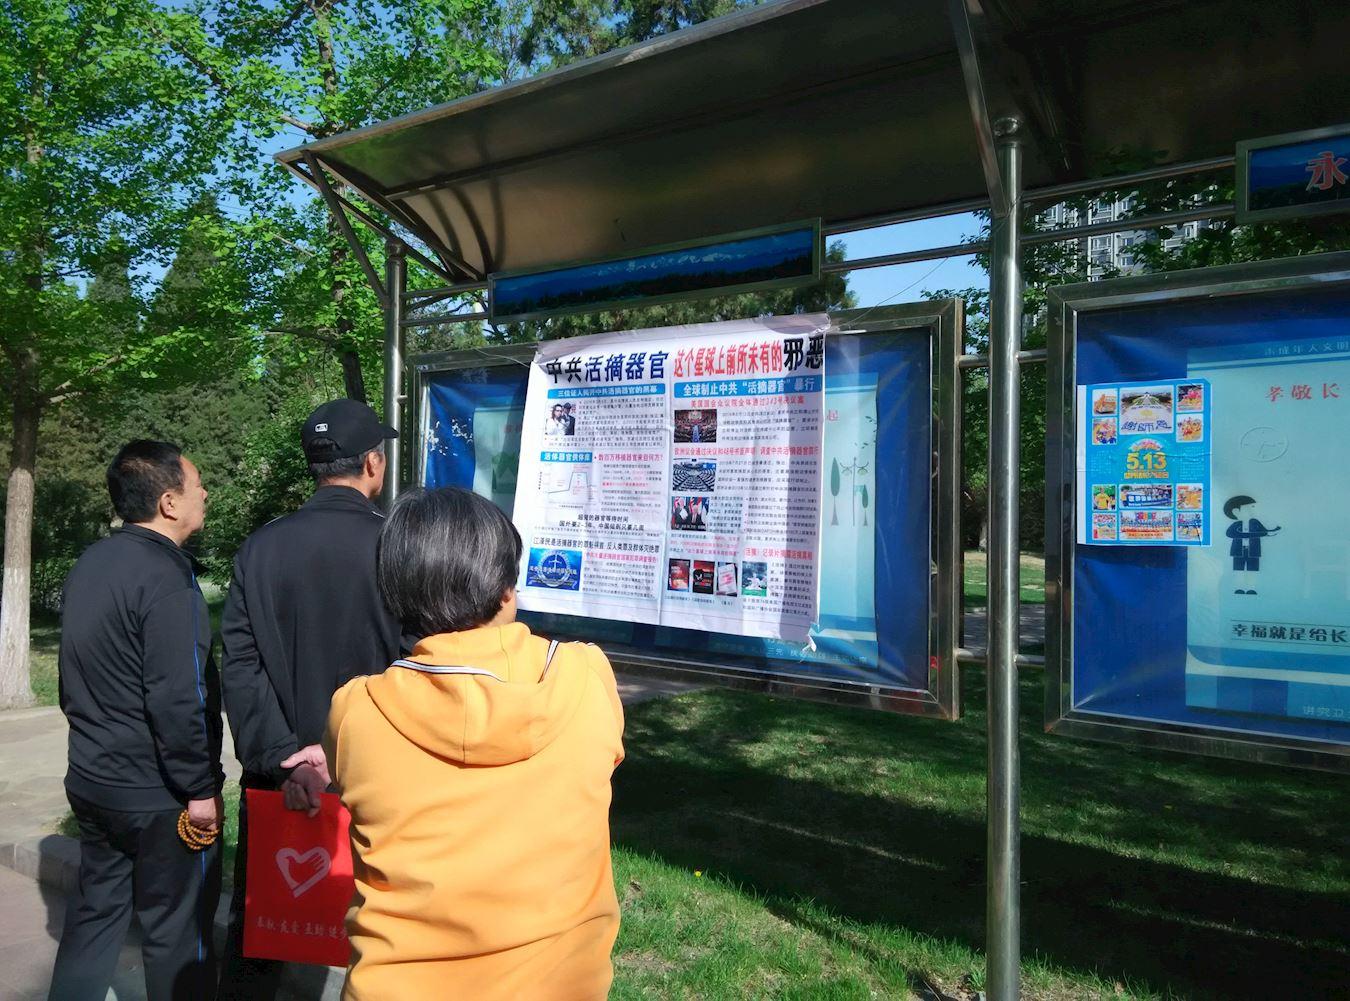 https://big5.minghui.org/mh/article_images/2018-5-20-43350943923432_03.jpg